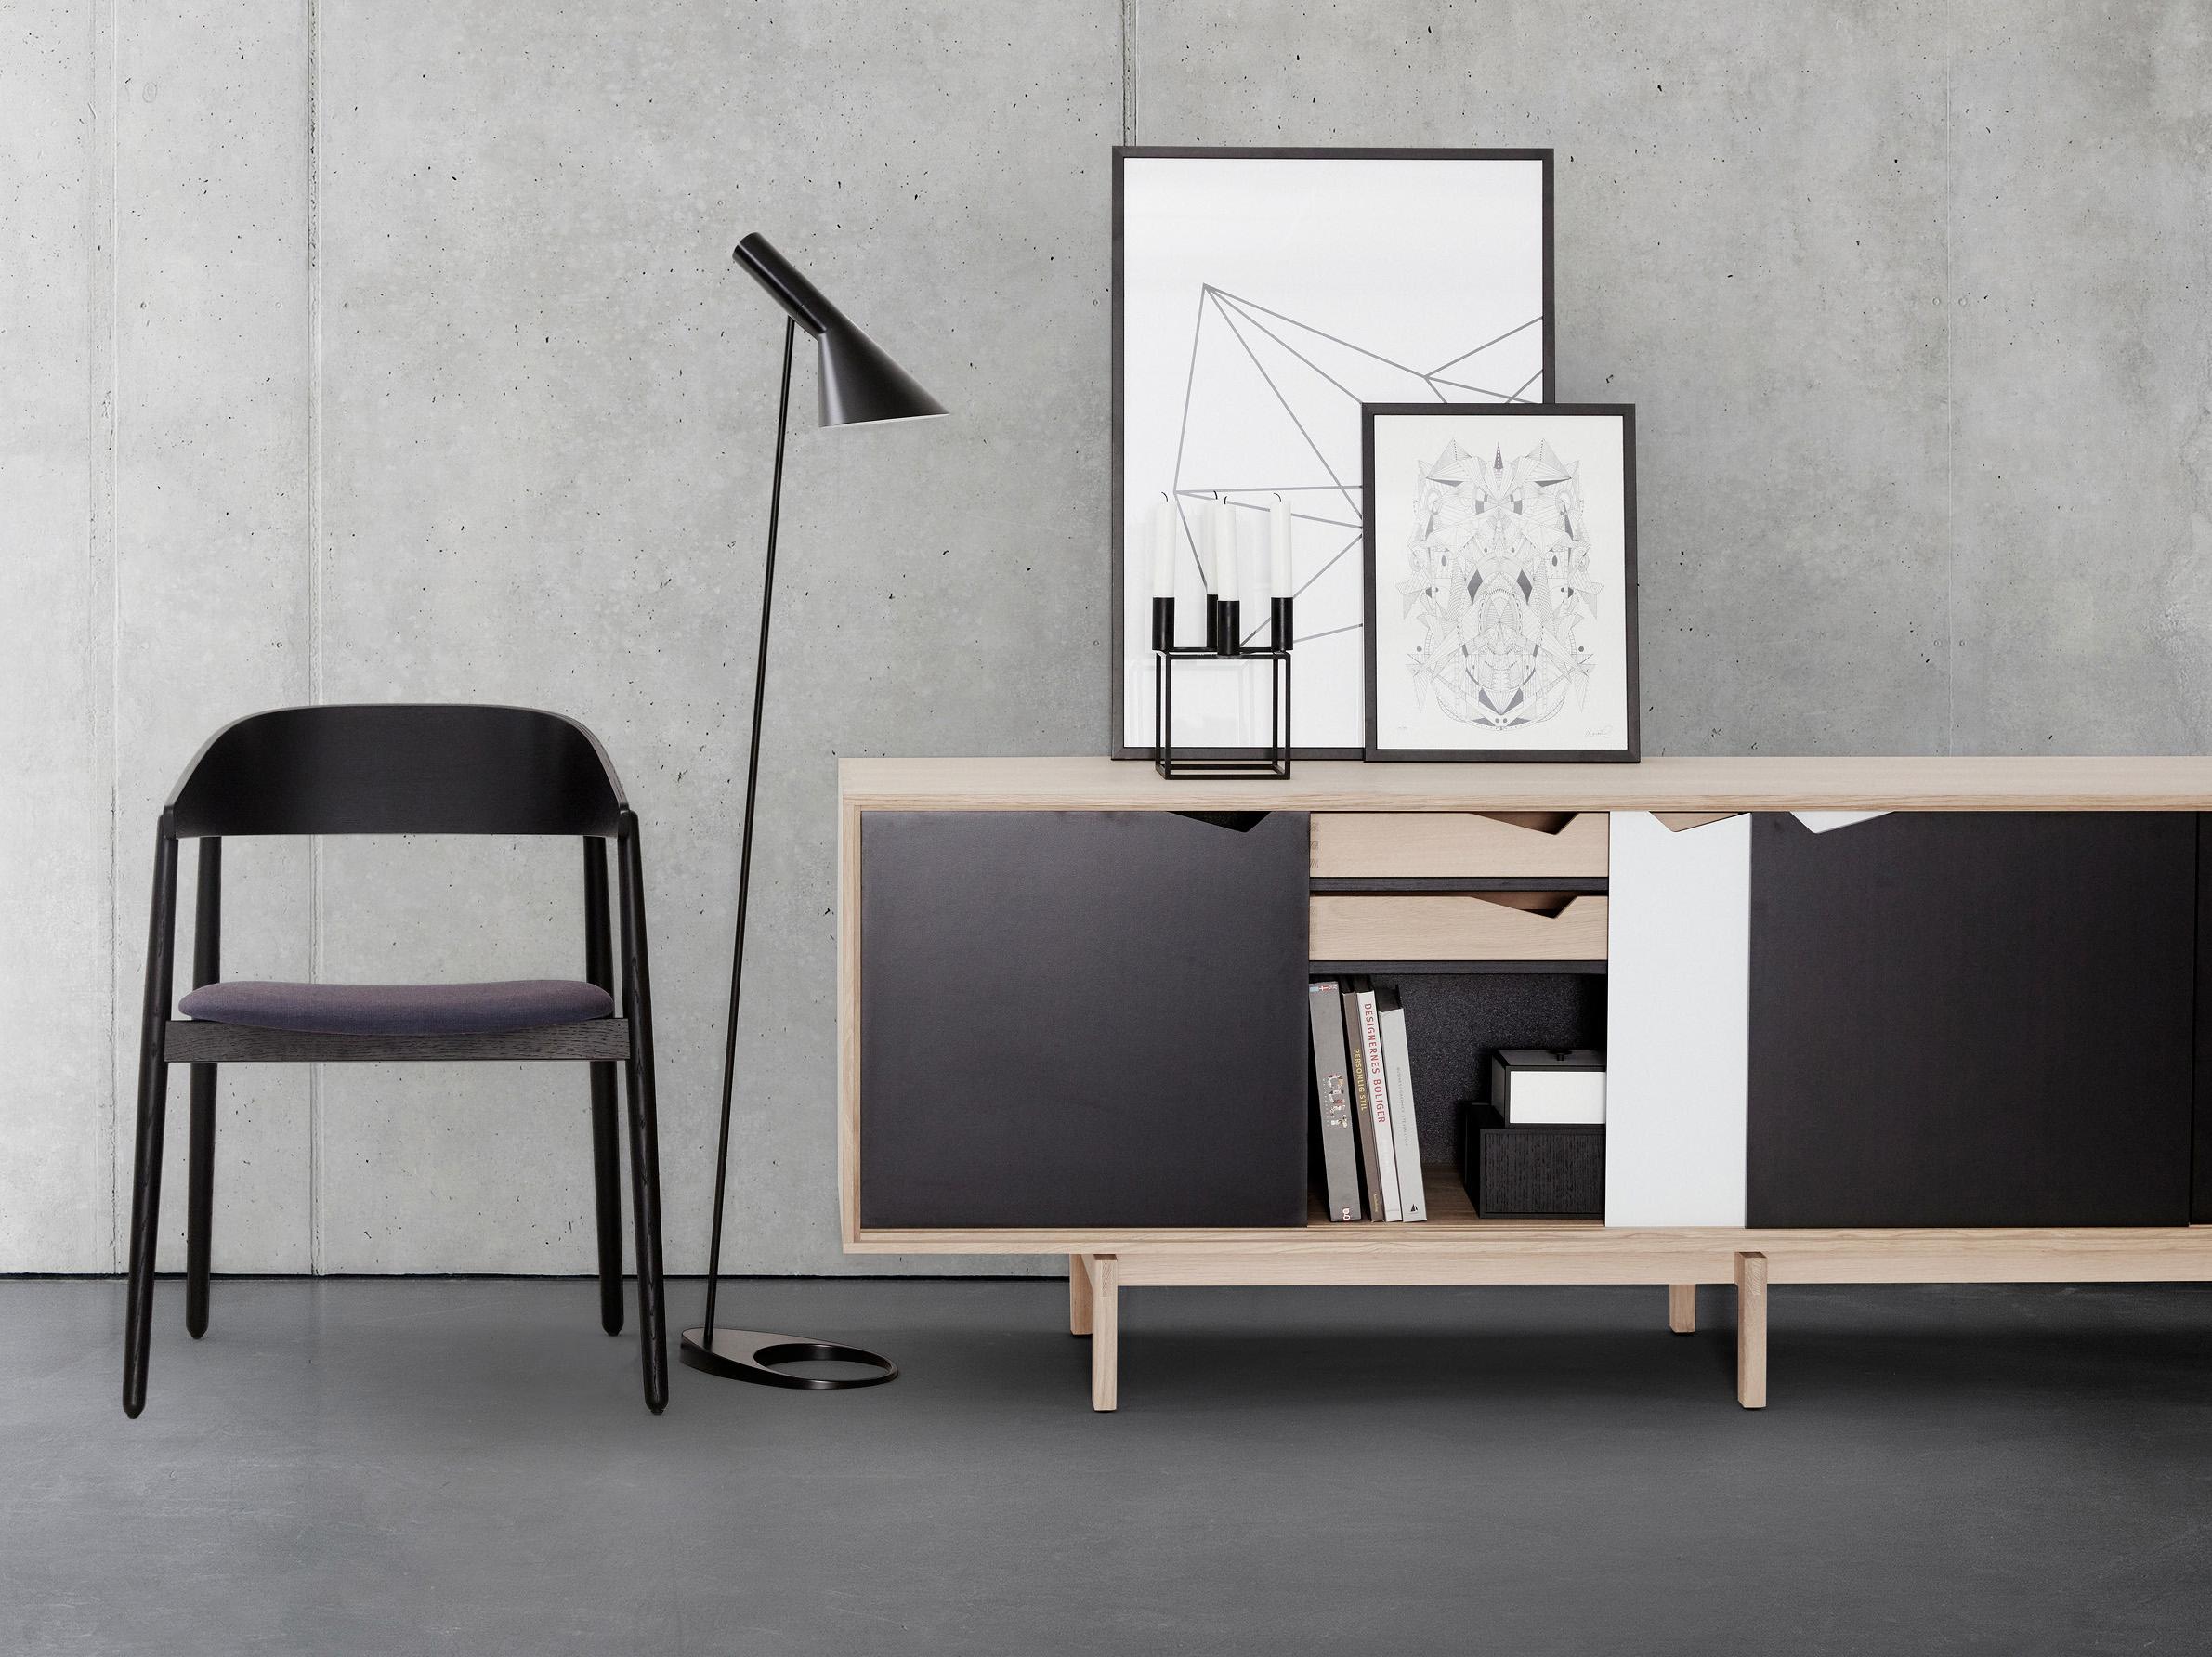 Andersen Furniture | Møbelgalleriet Stavanger | Designmøbler